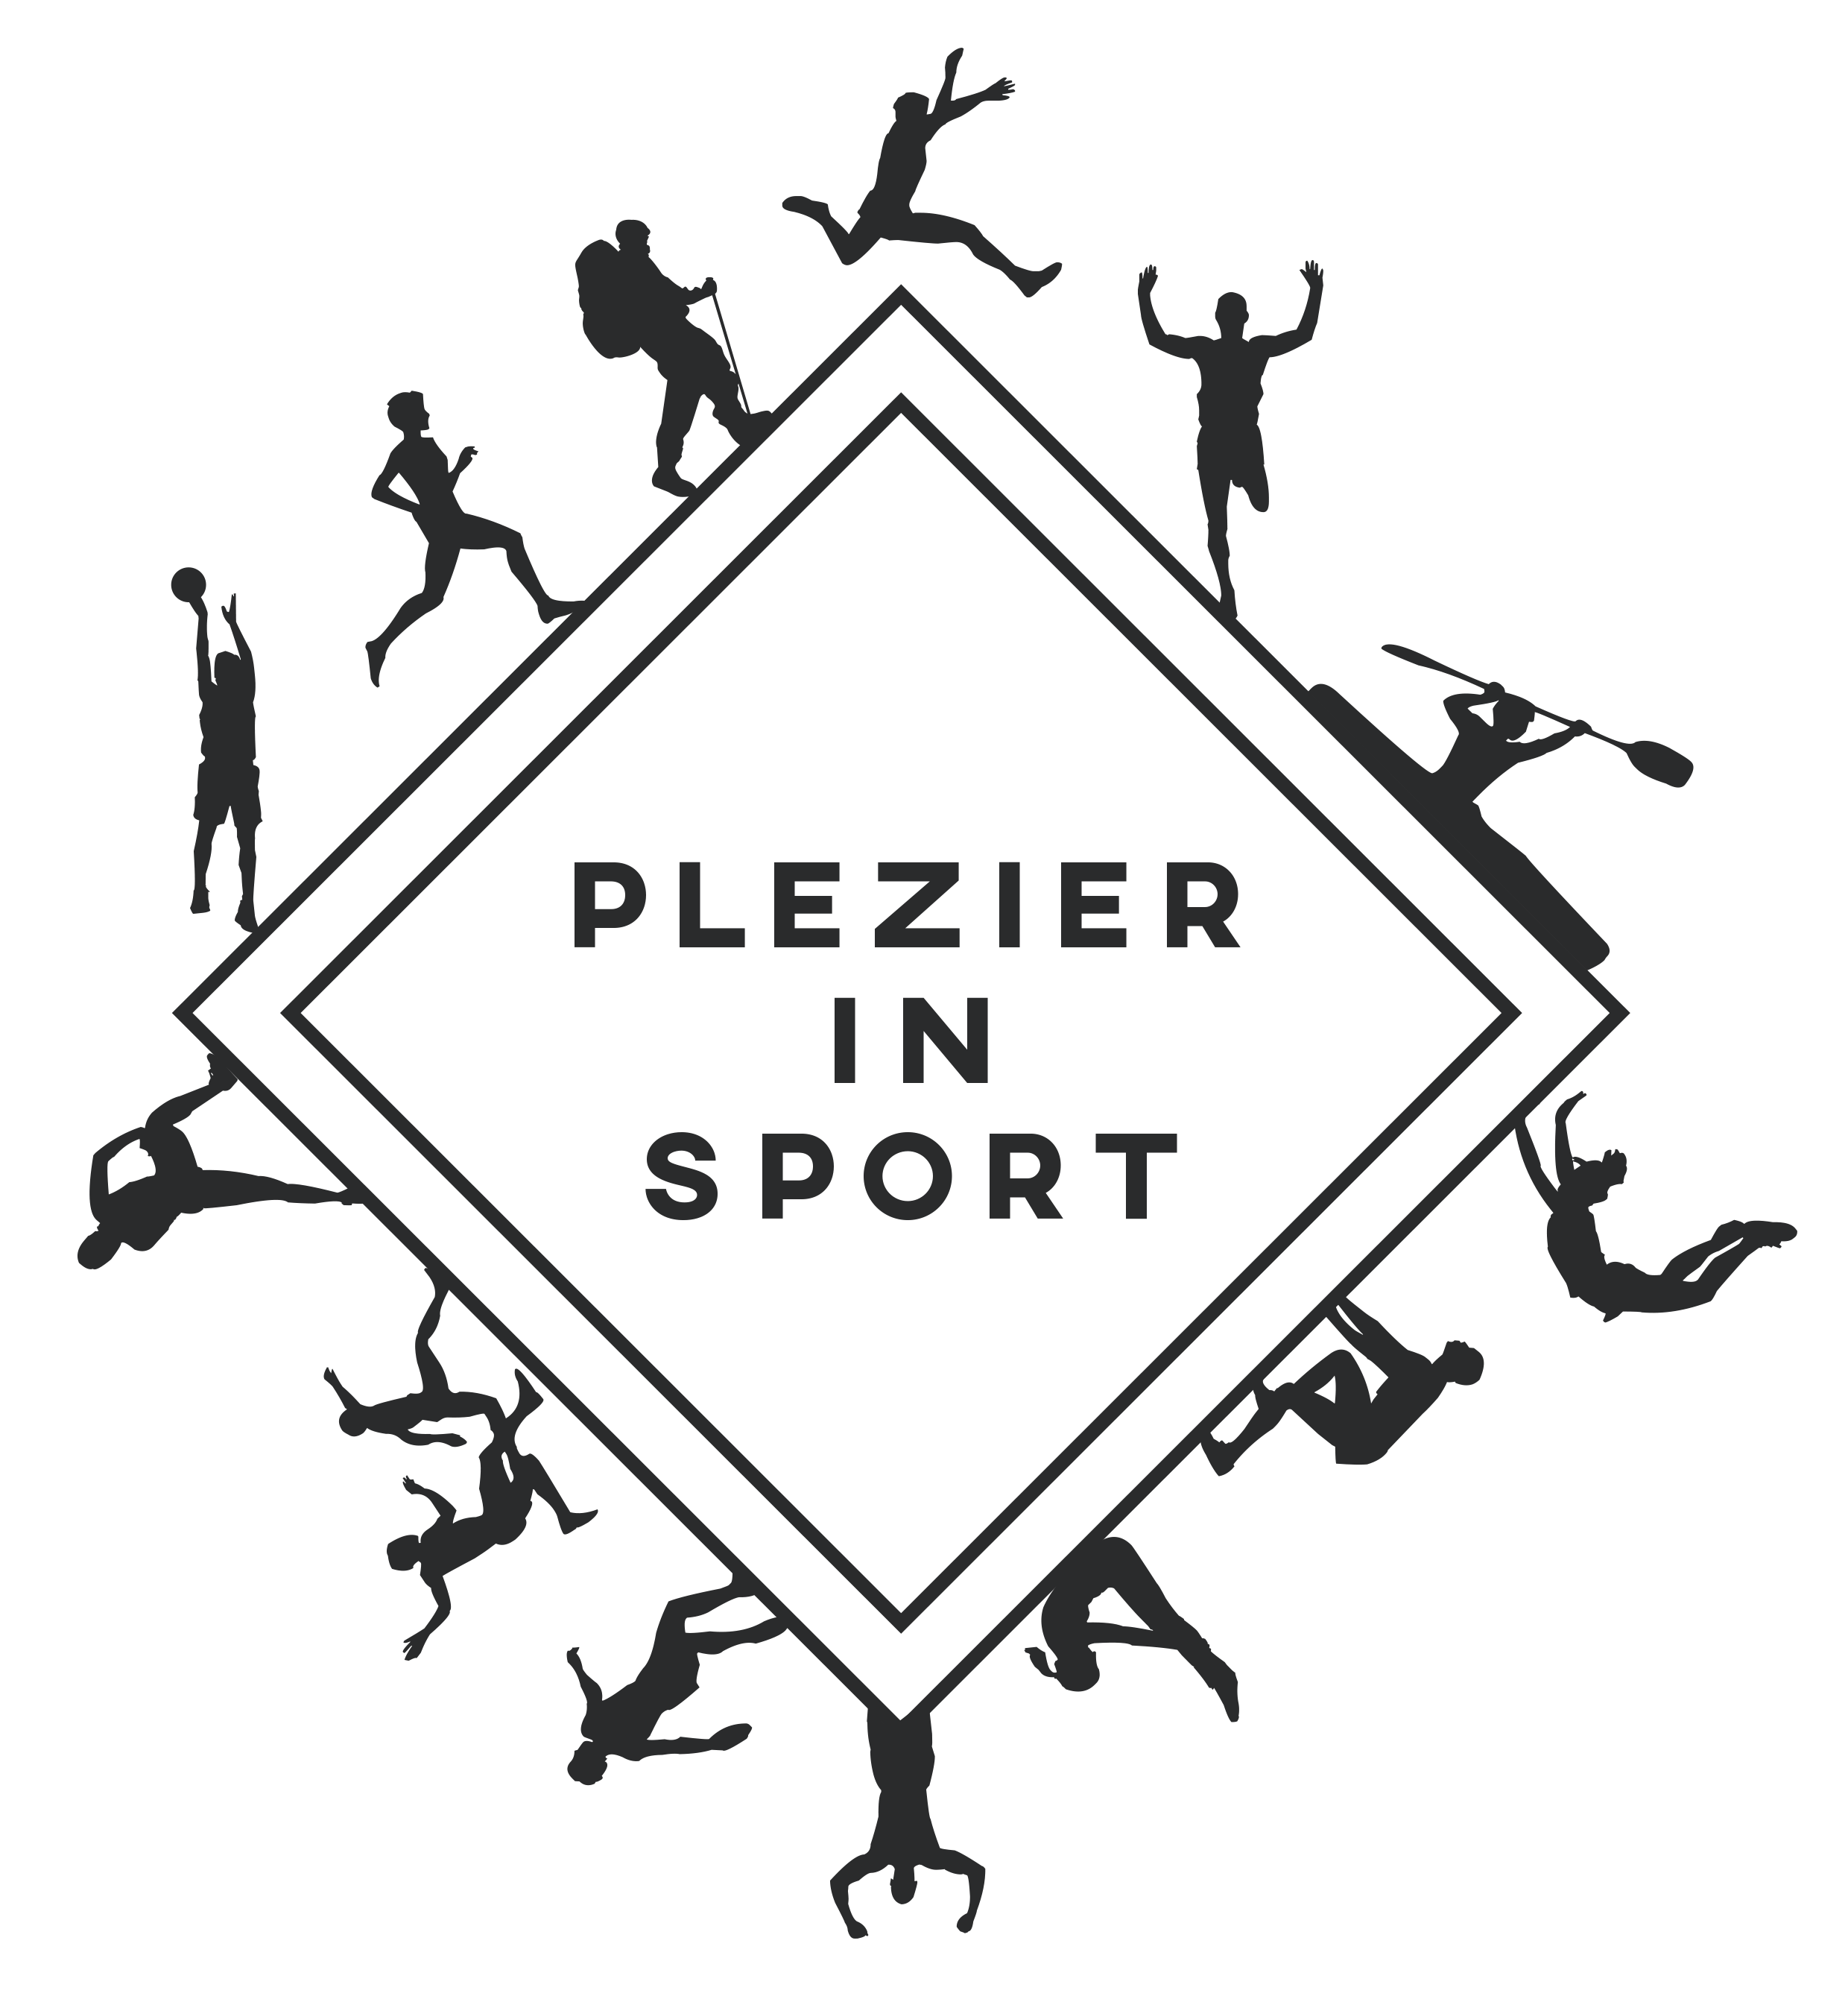 Plezier in Sport